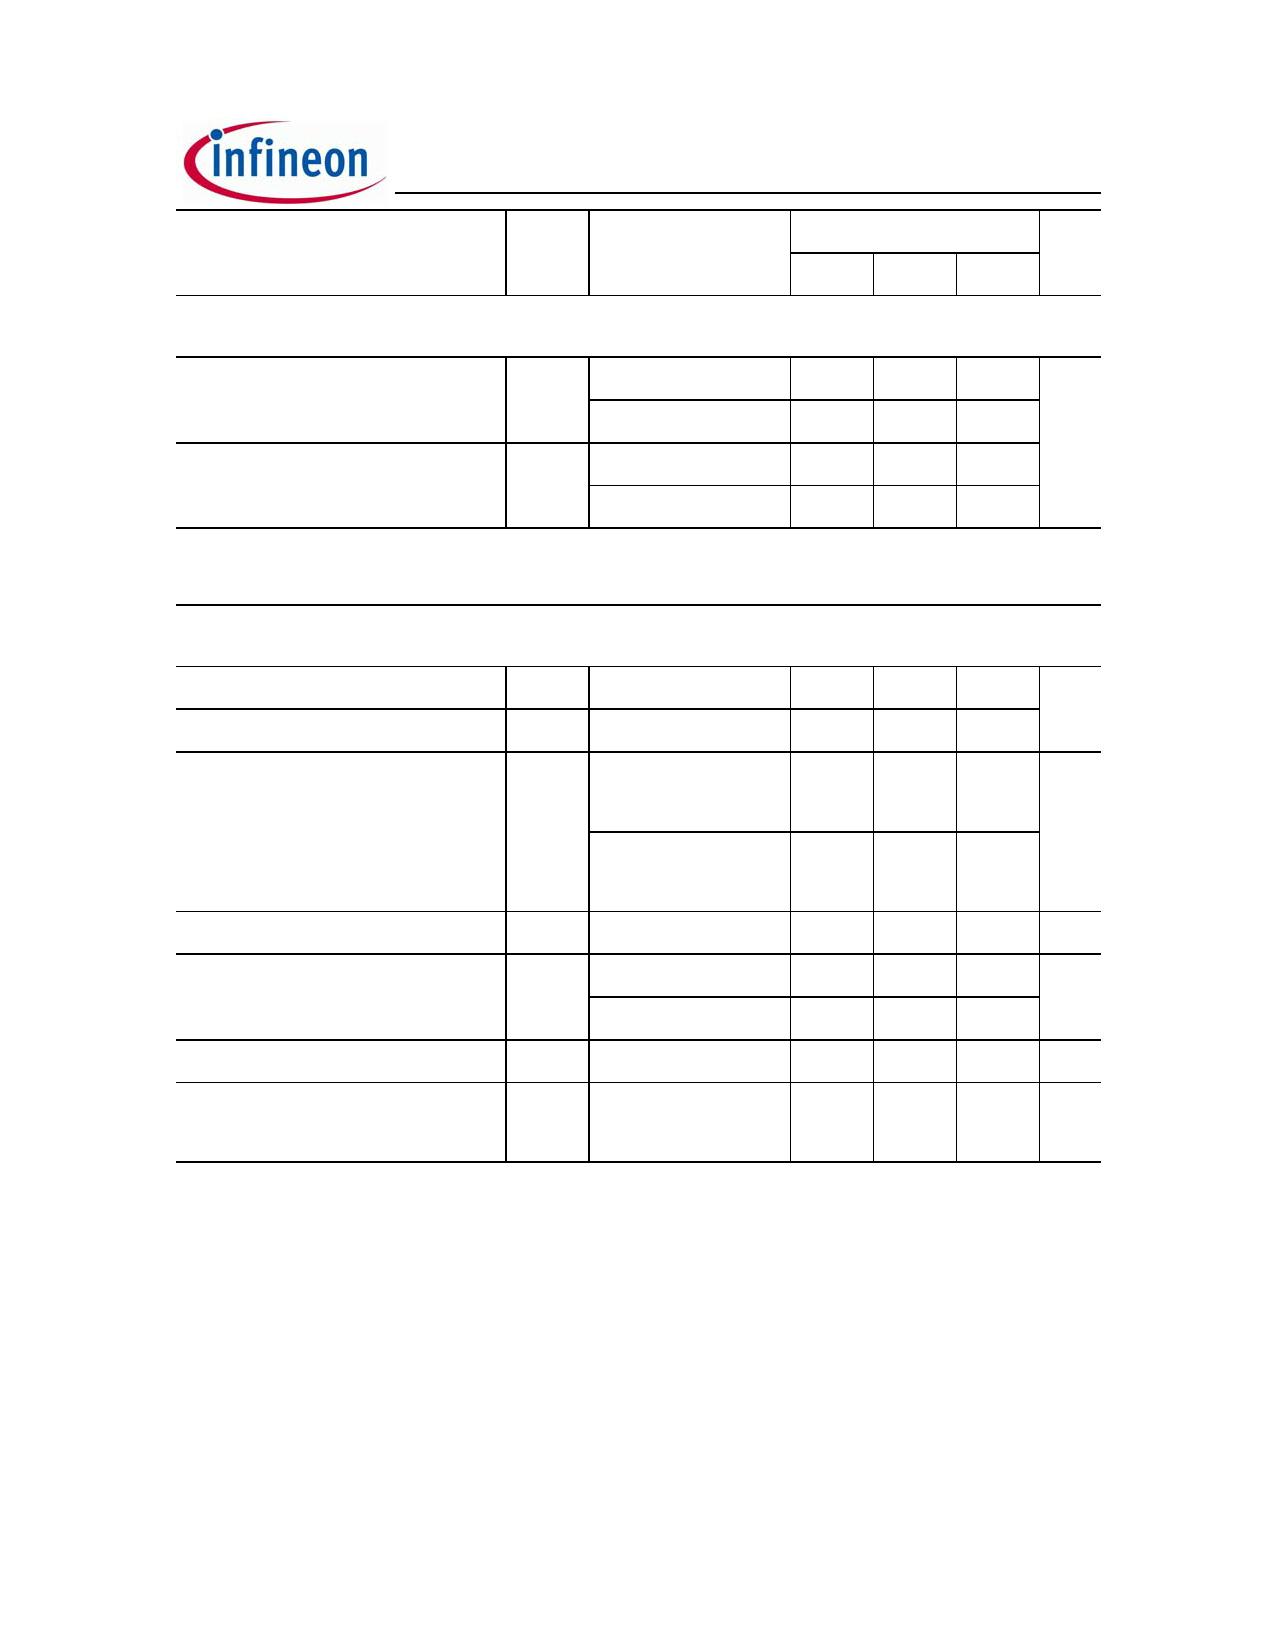 BSC032N03SG data sheet